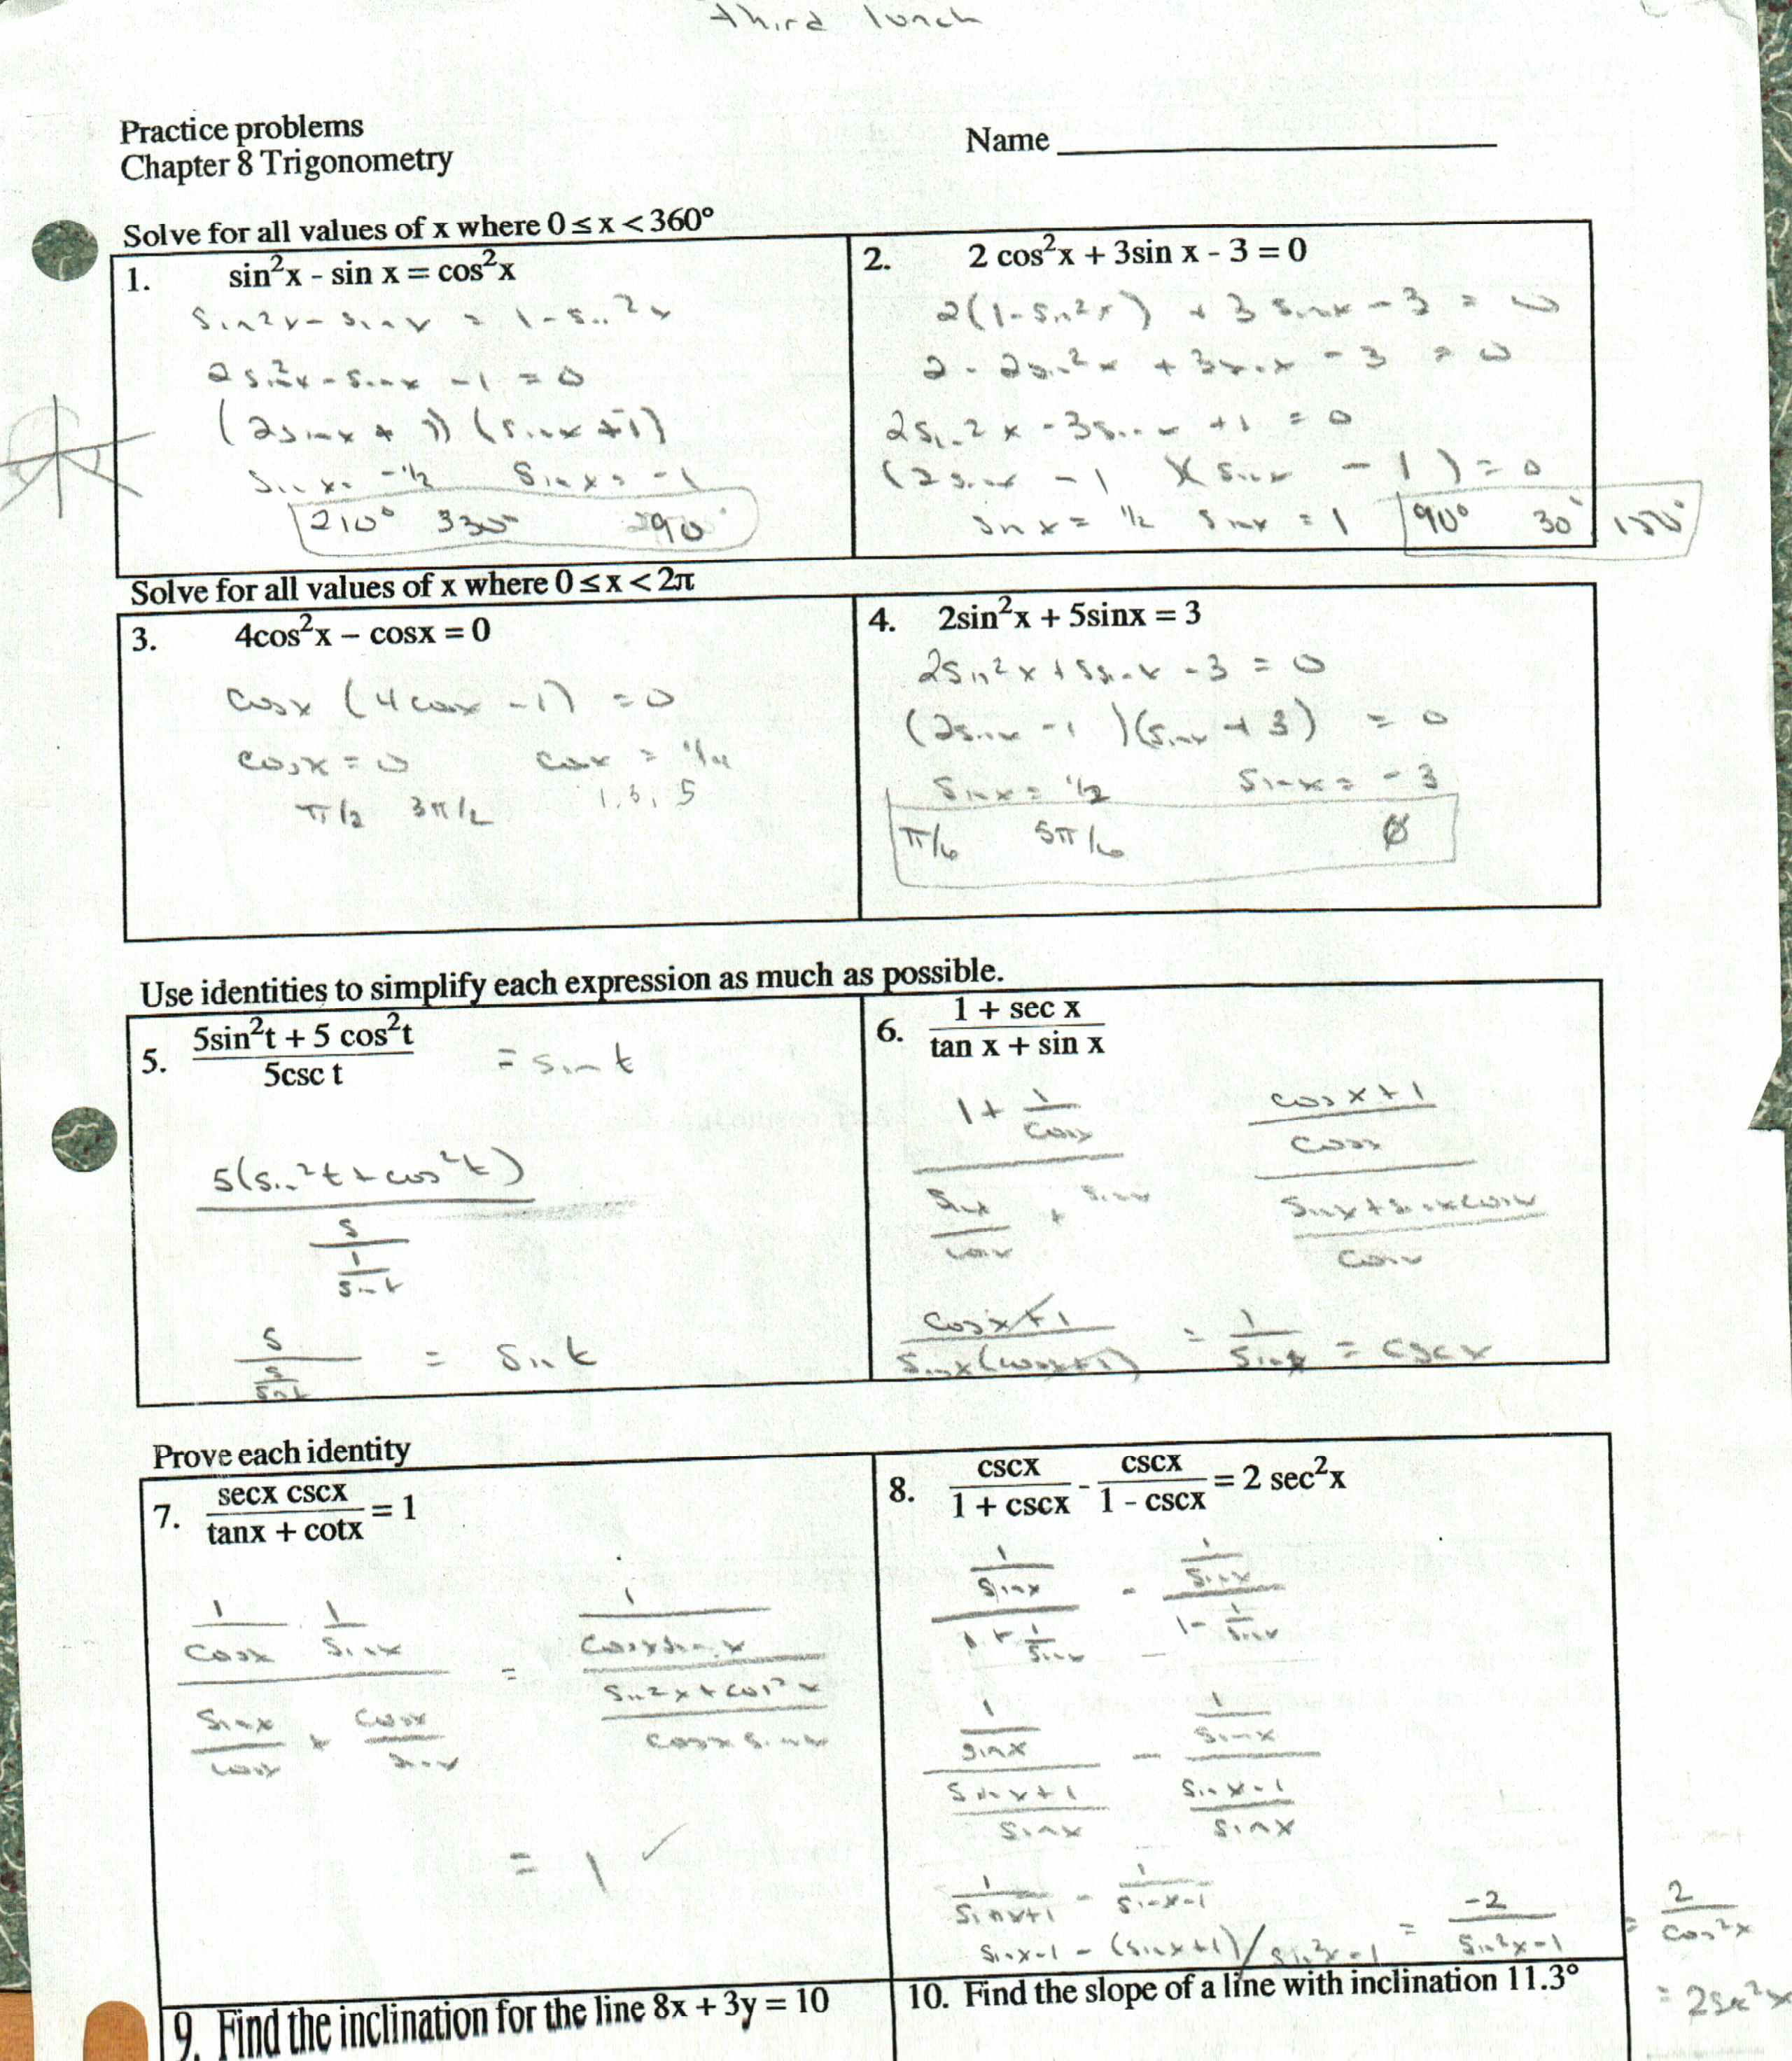 worksheet Verifying Trig Identities Worksheet trig identities worksheets free library download and ometric w ksheet ksheets libr ry